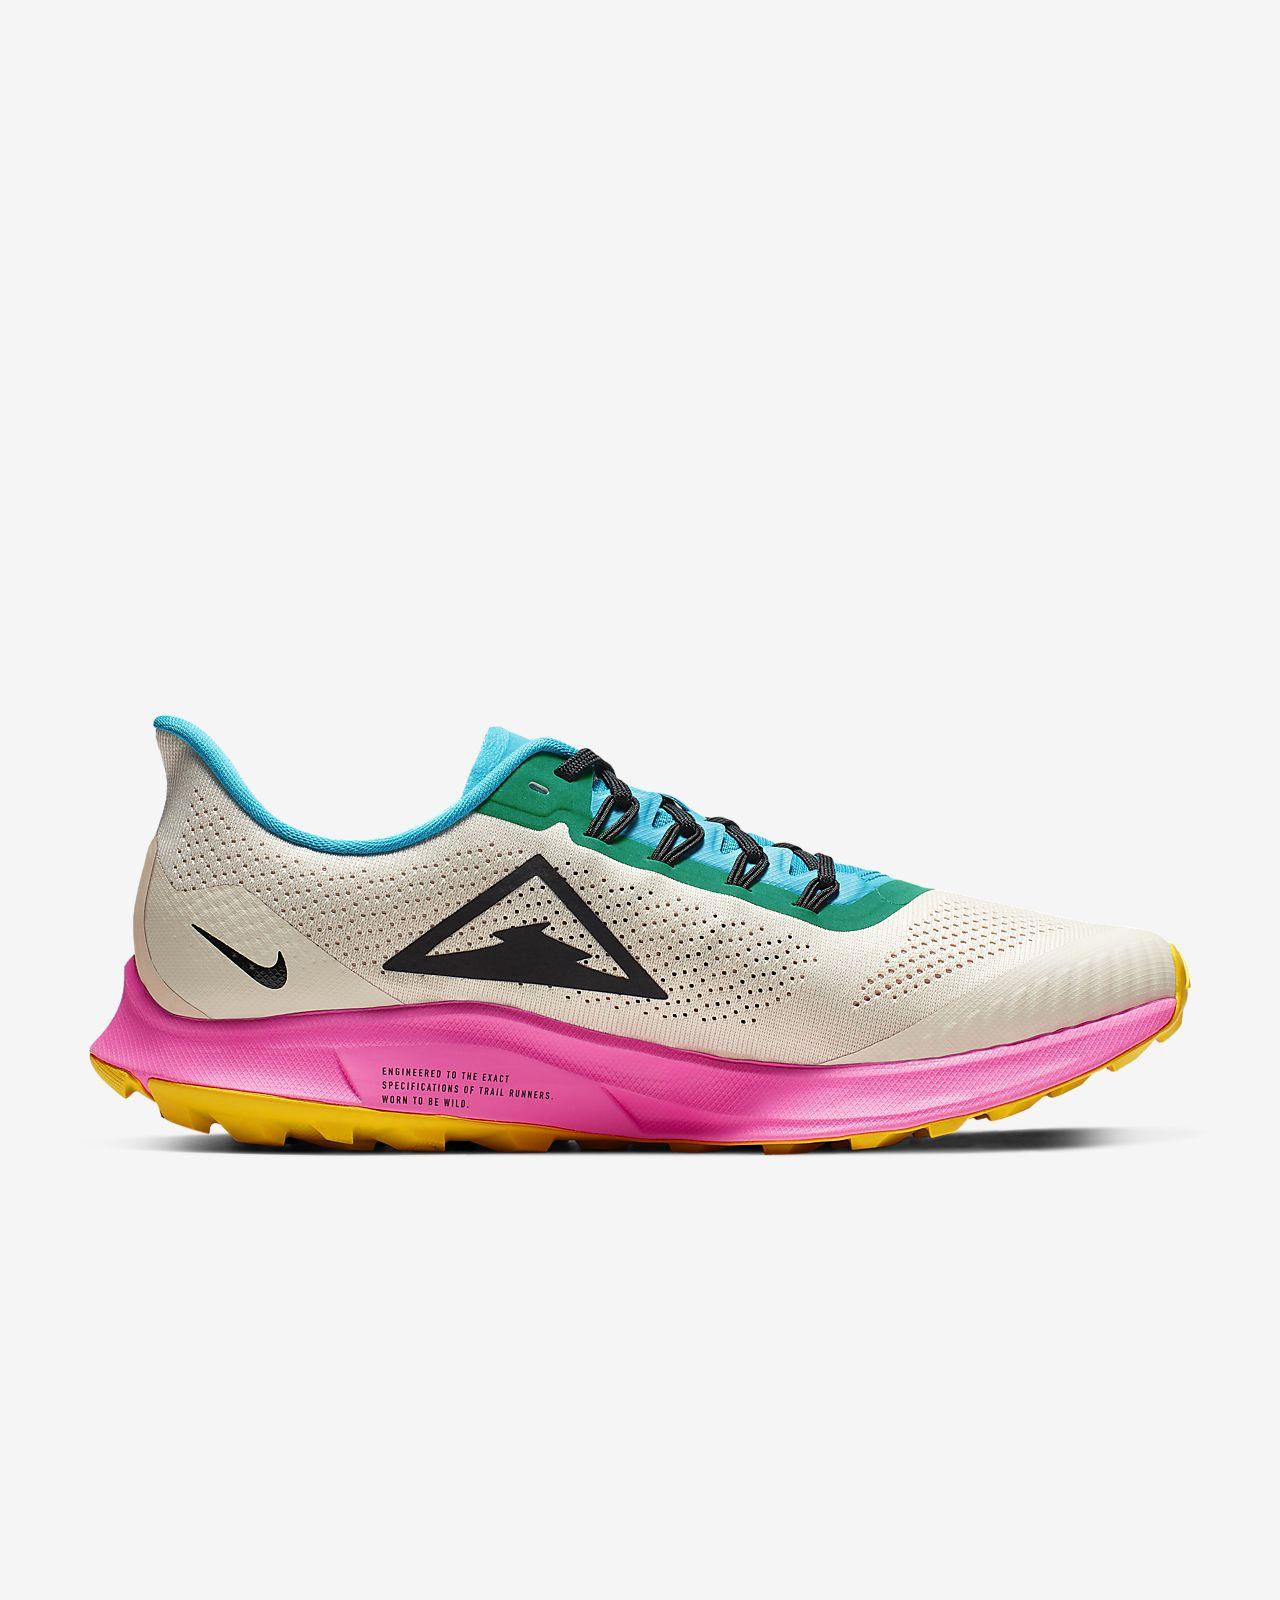 Homme Pegasus De Pour Zoom Hrdsqtcx Air Chaussure Nike Running 36 Trail 0X8PwnOk